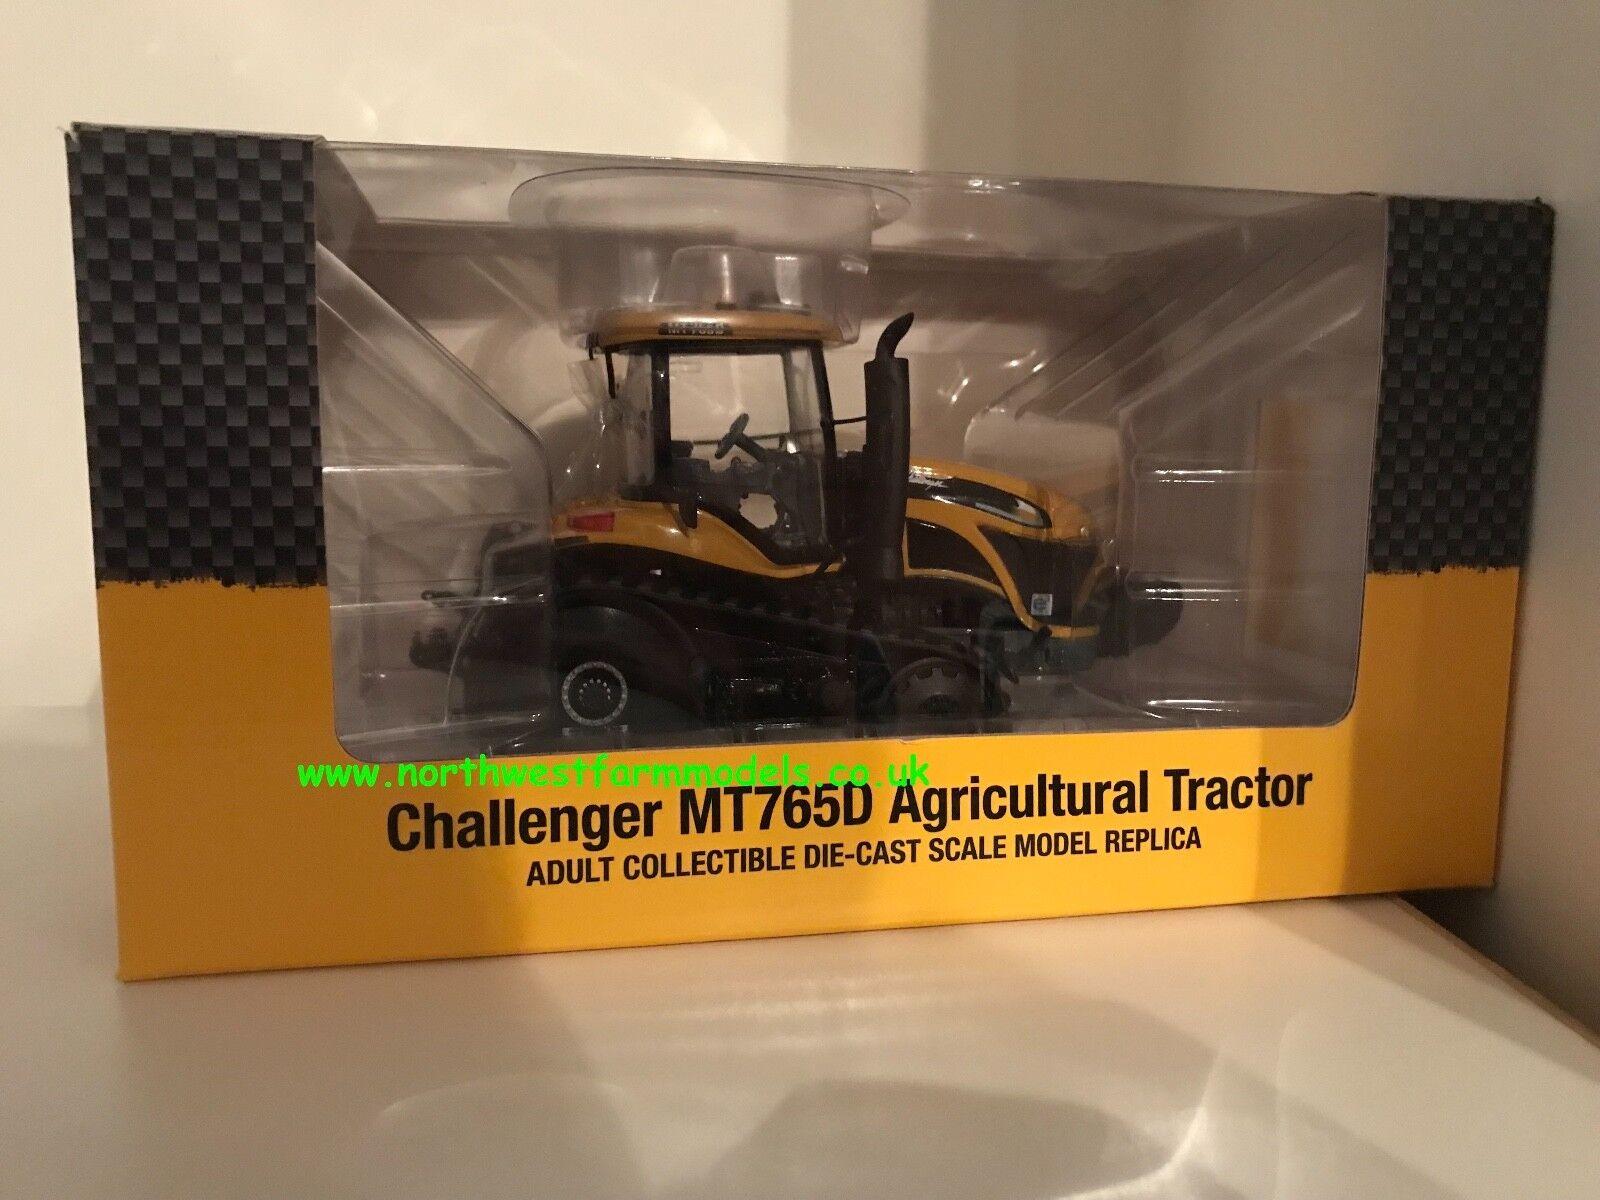 promociones emocionantes USK Scale Scale Scale Models 1 32 Scal Challenger MT765D Tractor de orugas  Vuelta de 10 dias